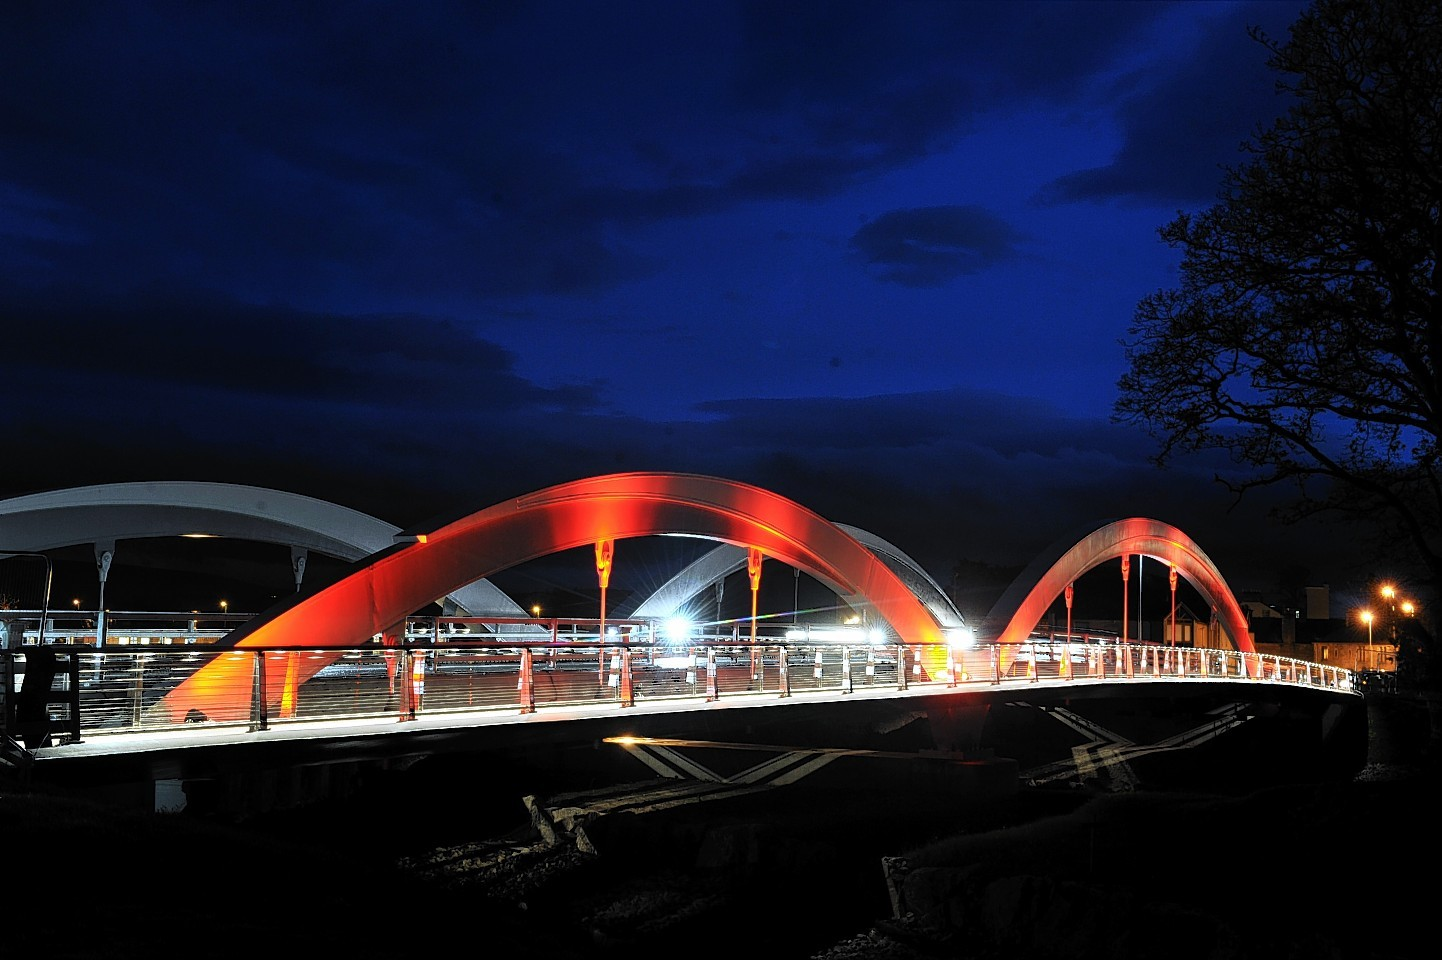 The lit up Landshut Bridge